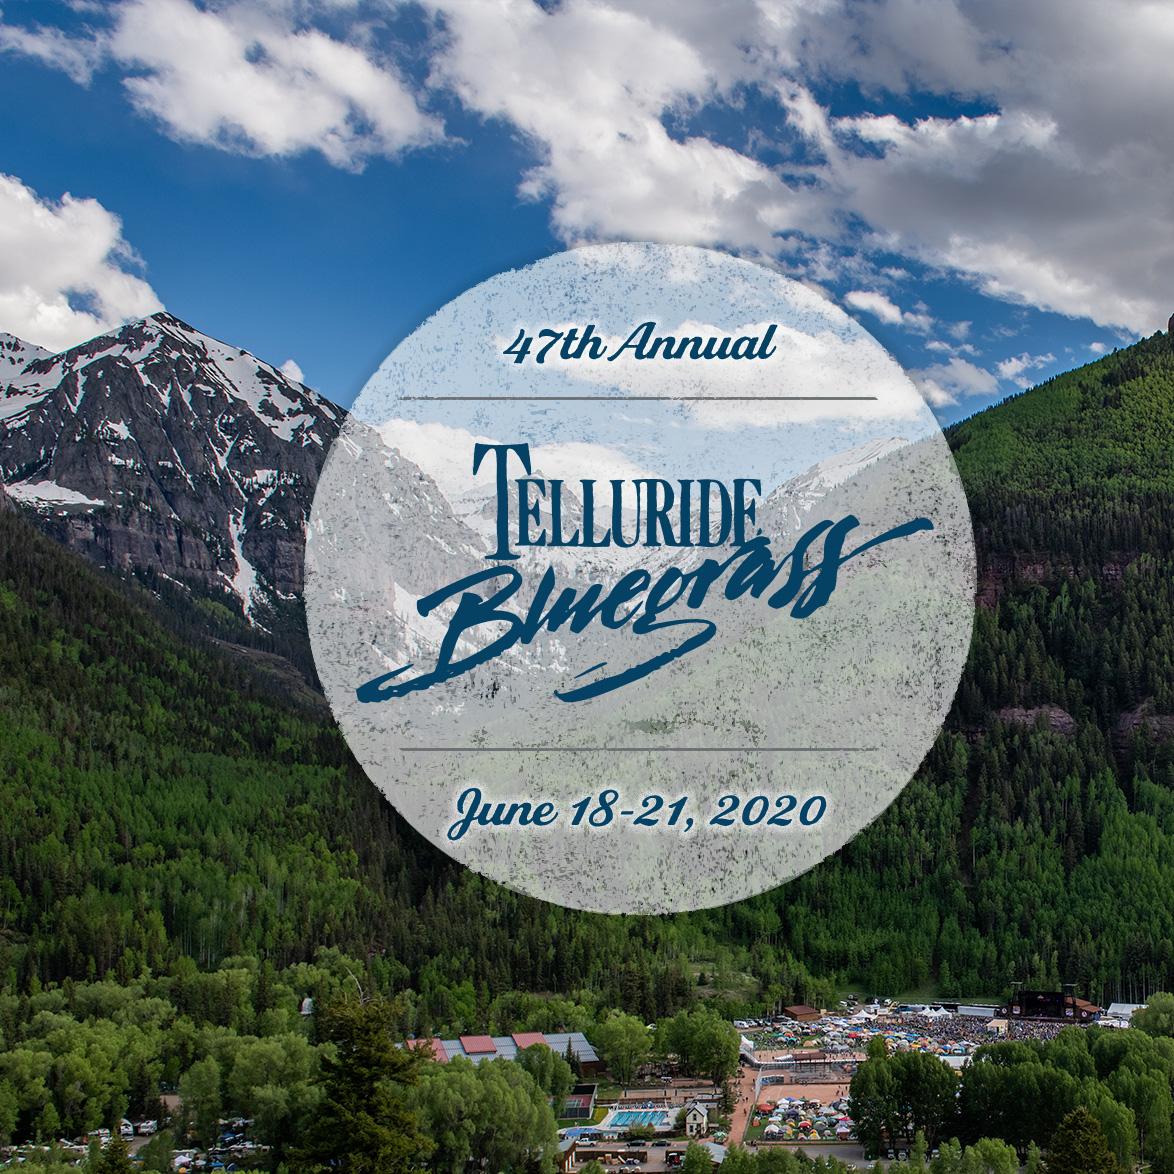 Telluride Bluegrass Festival 2020.Buy Tickets To Telluride Bluegrass 2020 In Telluride On Jun